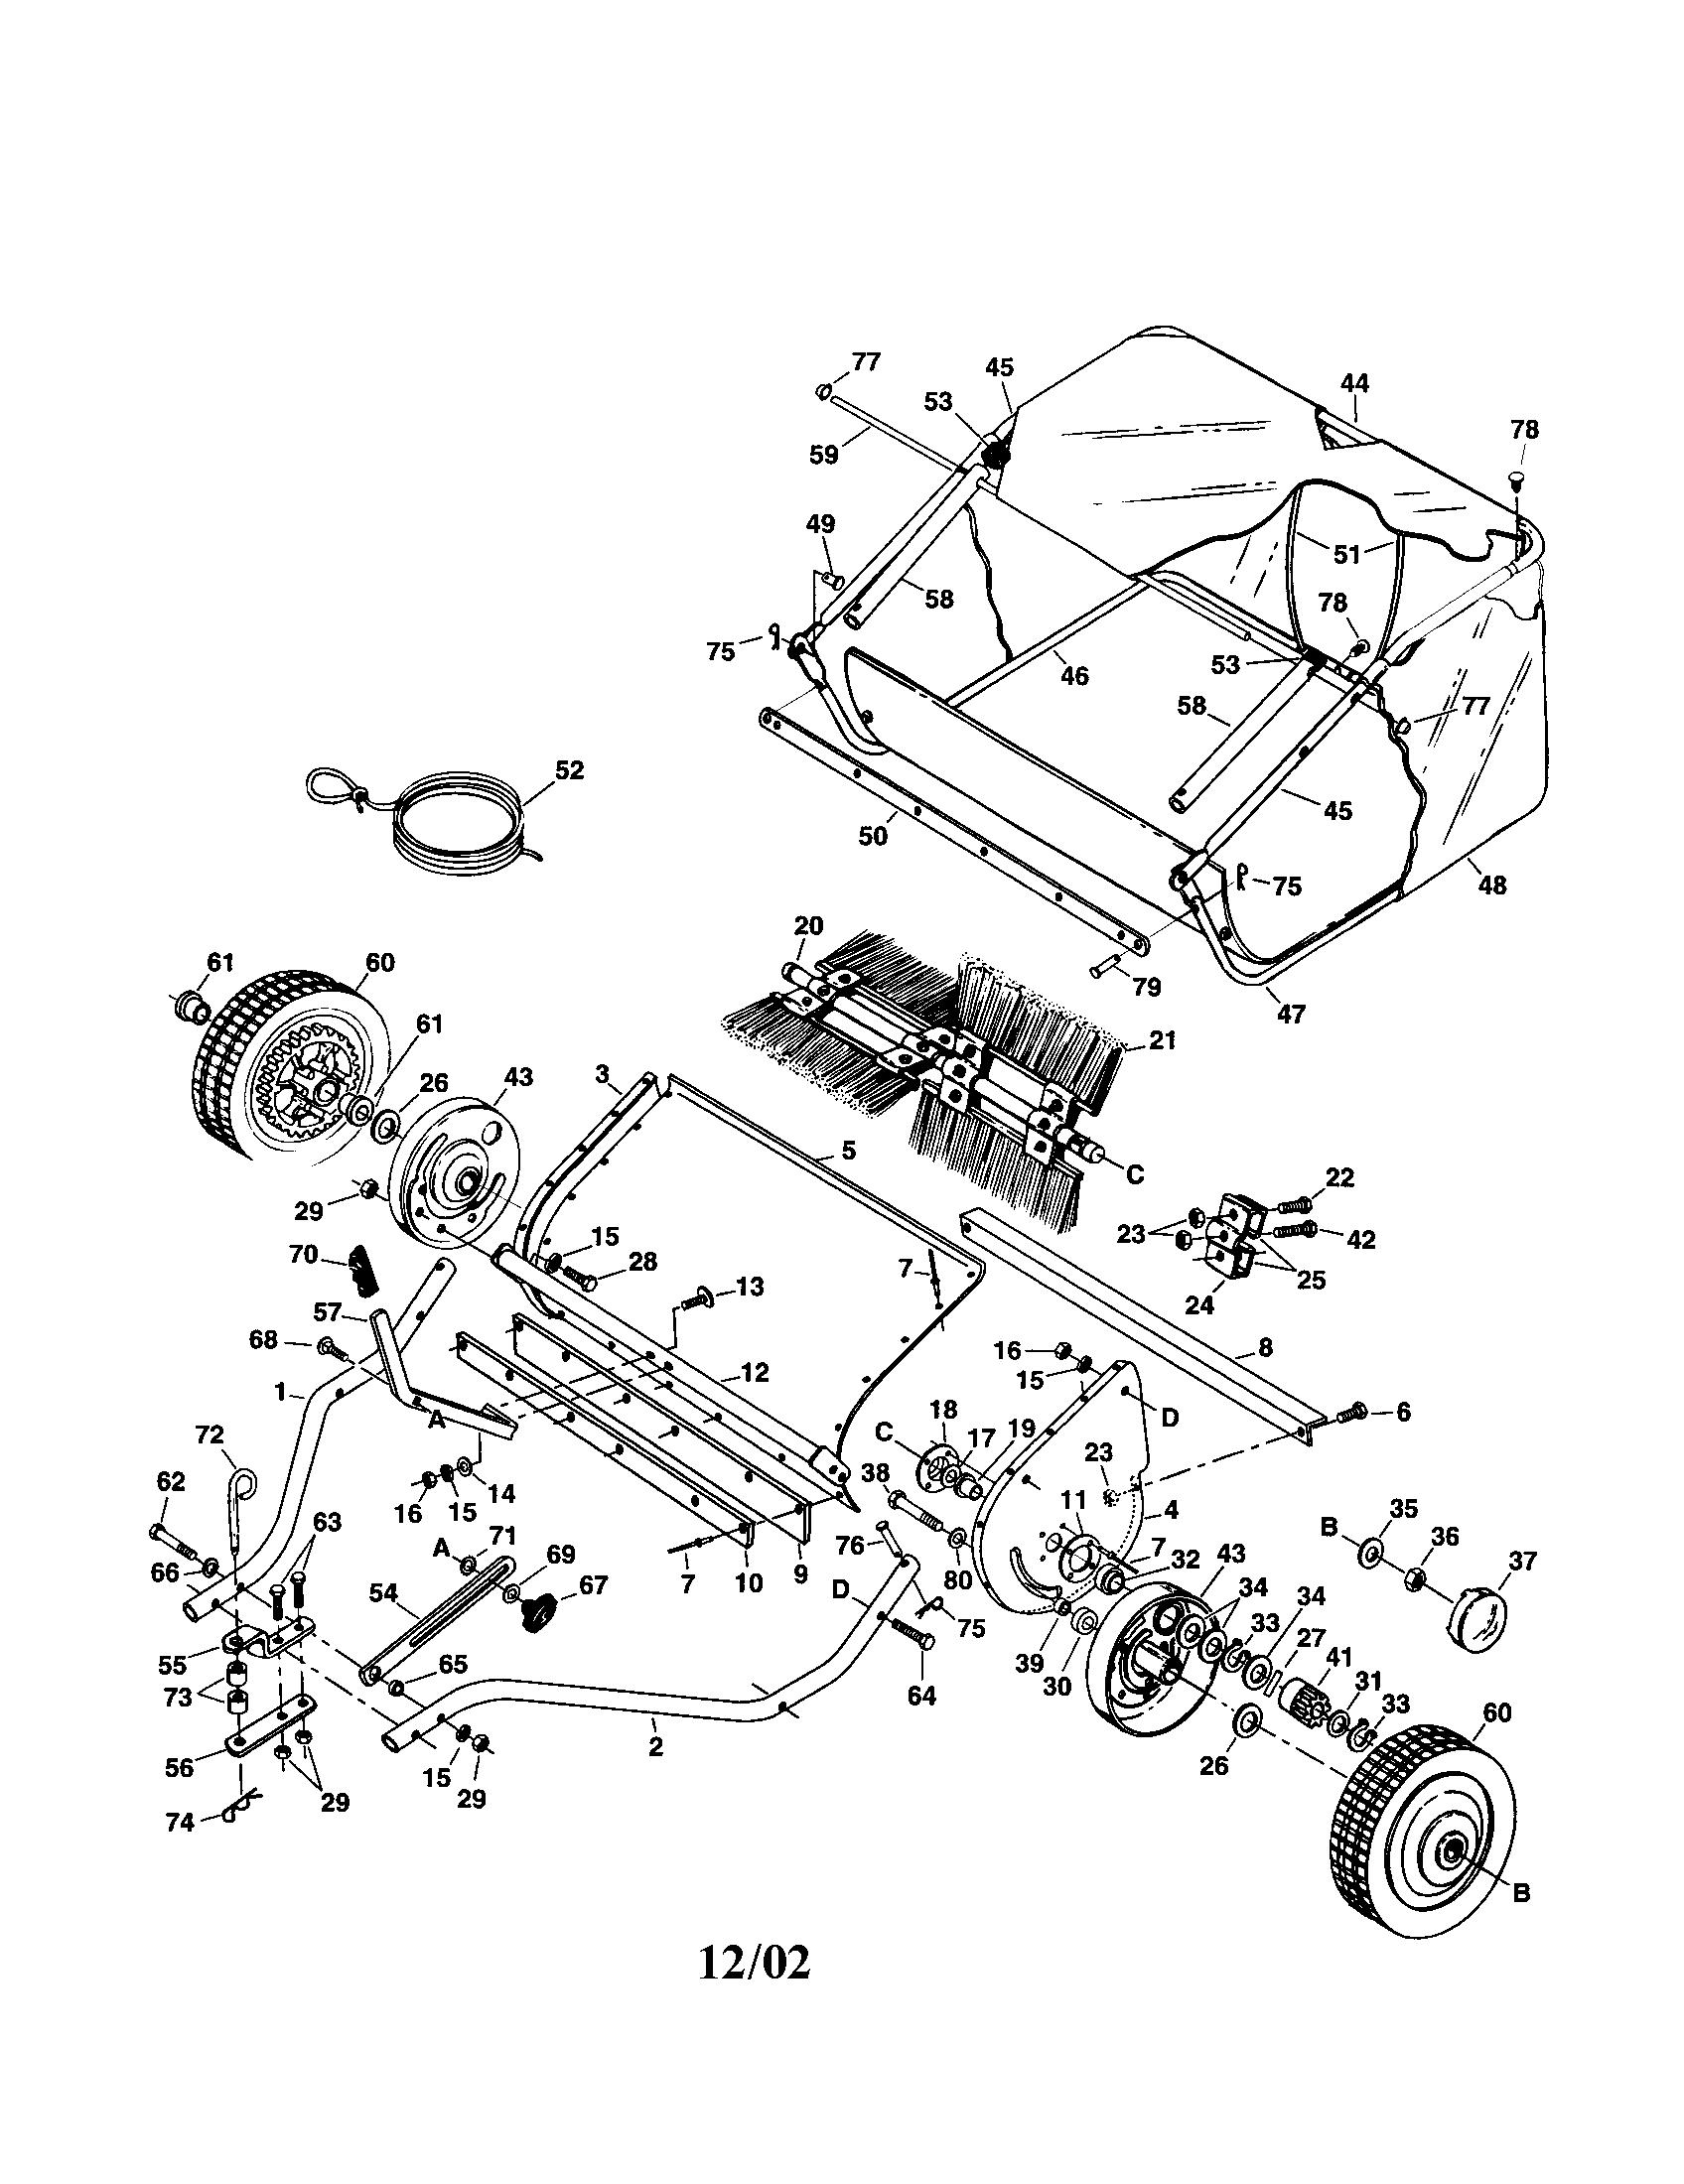 Agri fab model 45 02602 lawn sweeper genuine parts lawn sweeper manual lawn sweeper diagram